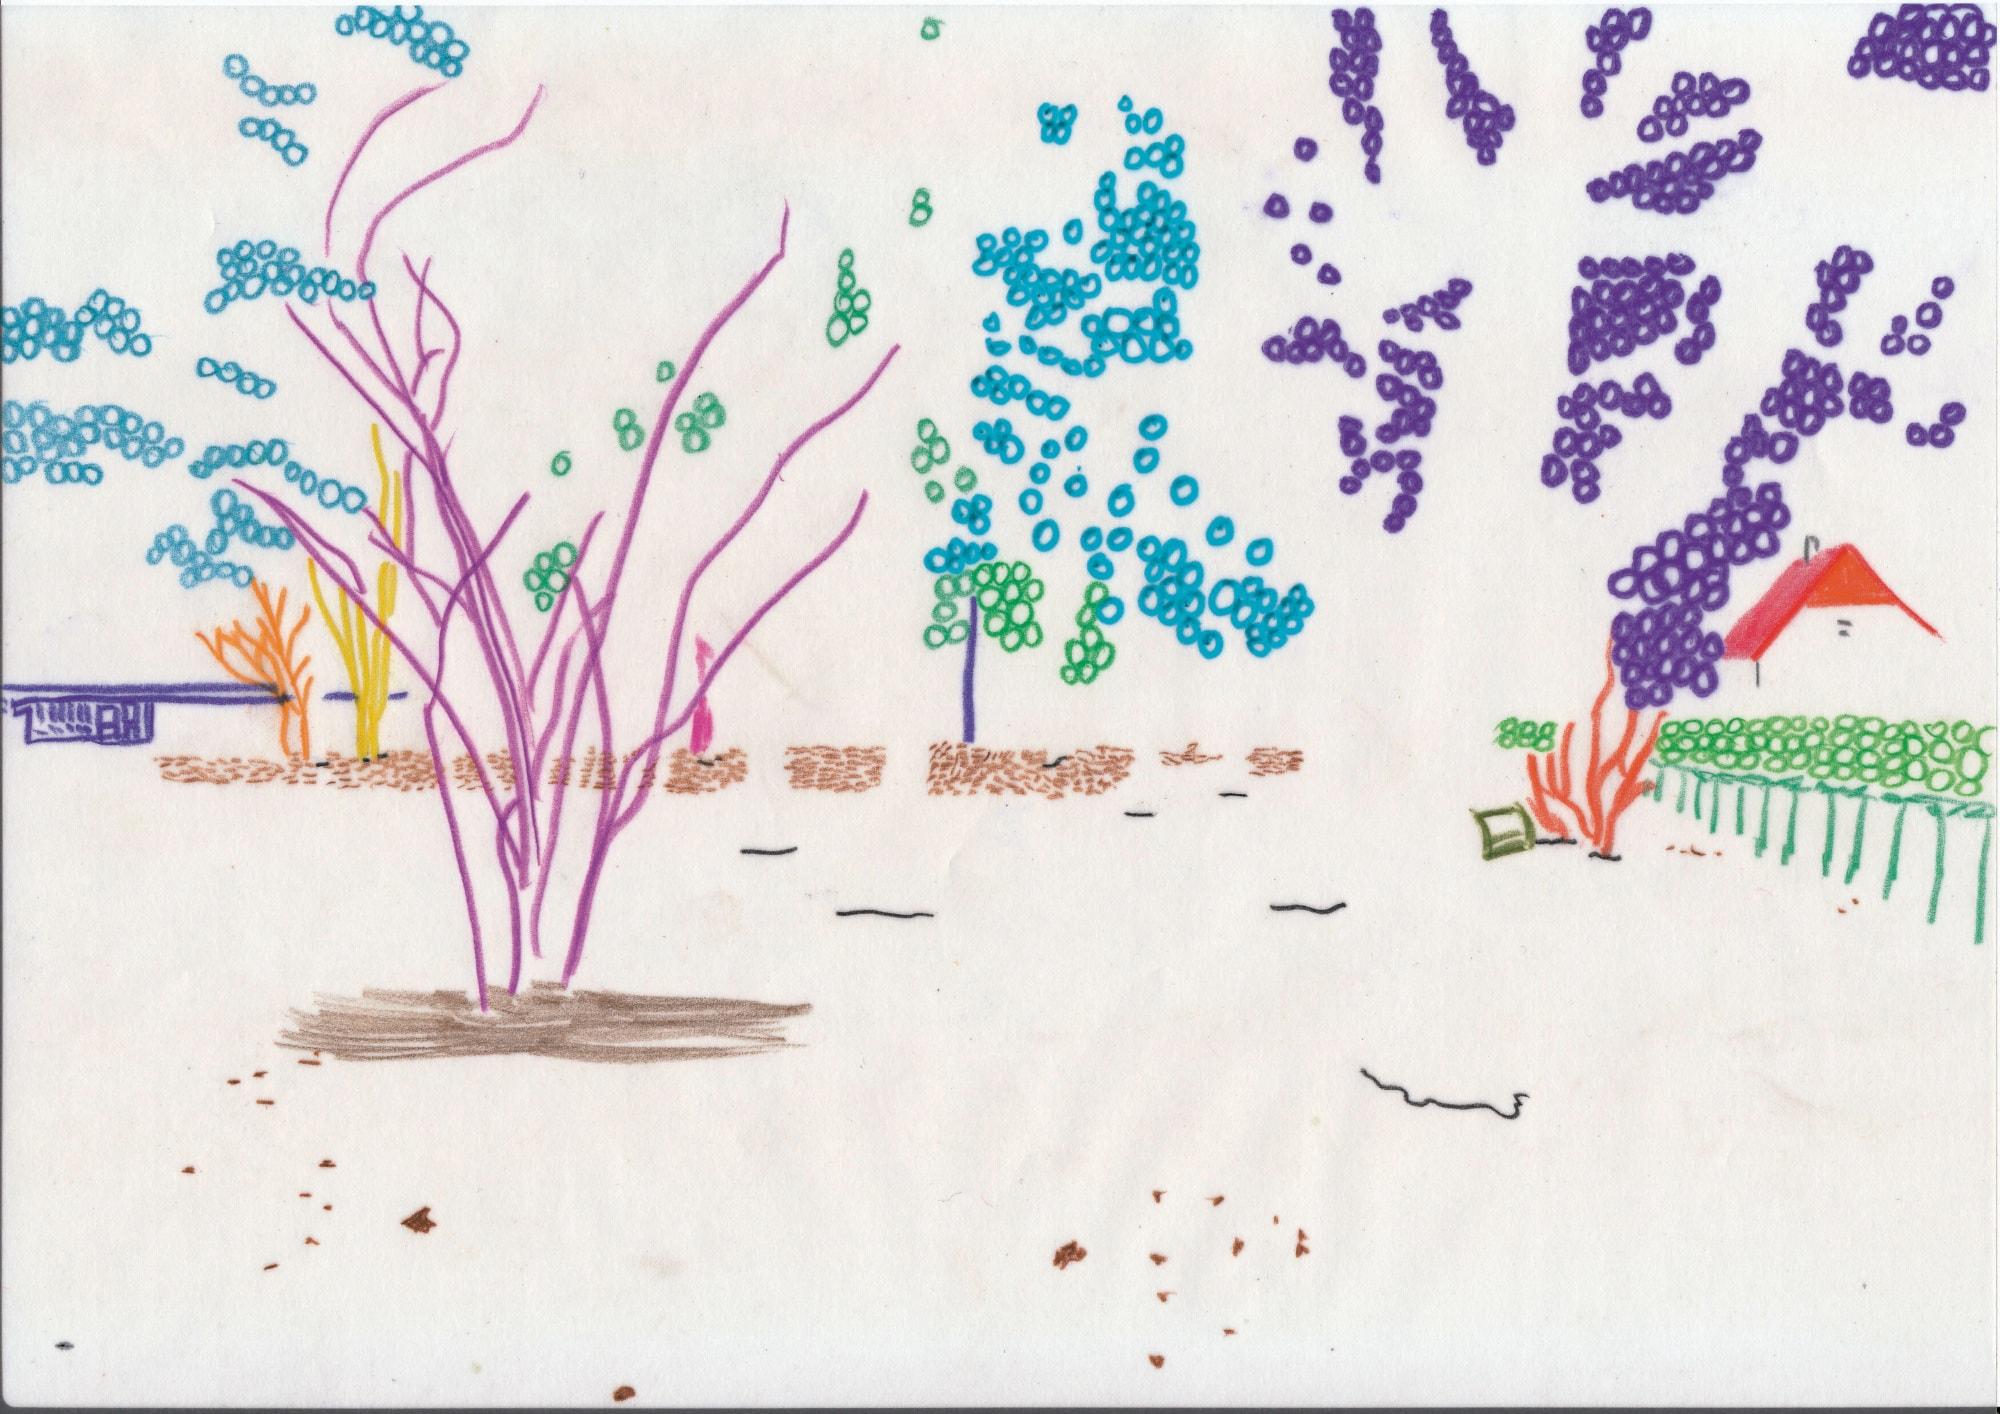 Zeichnung, Mischtechnik auf Papier digital bearbeitet, A4, abstrahierte Landschaft, artist: Franziska King